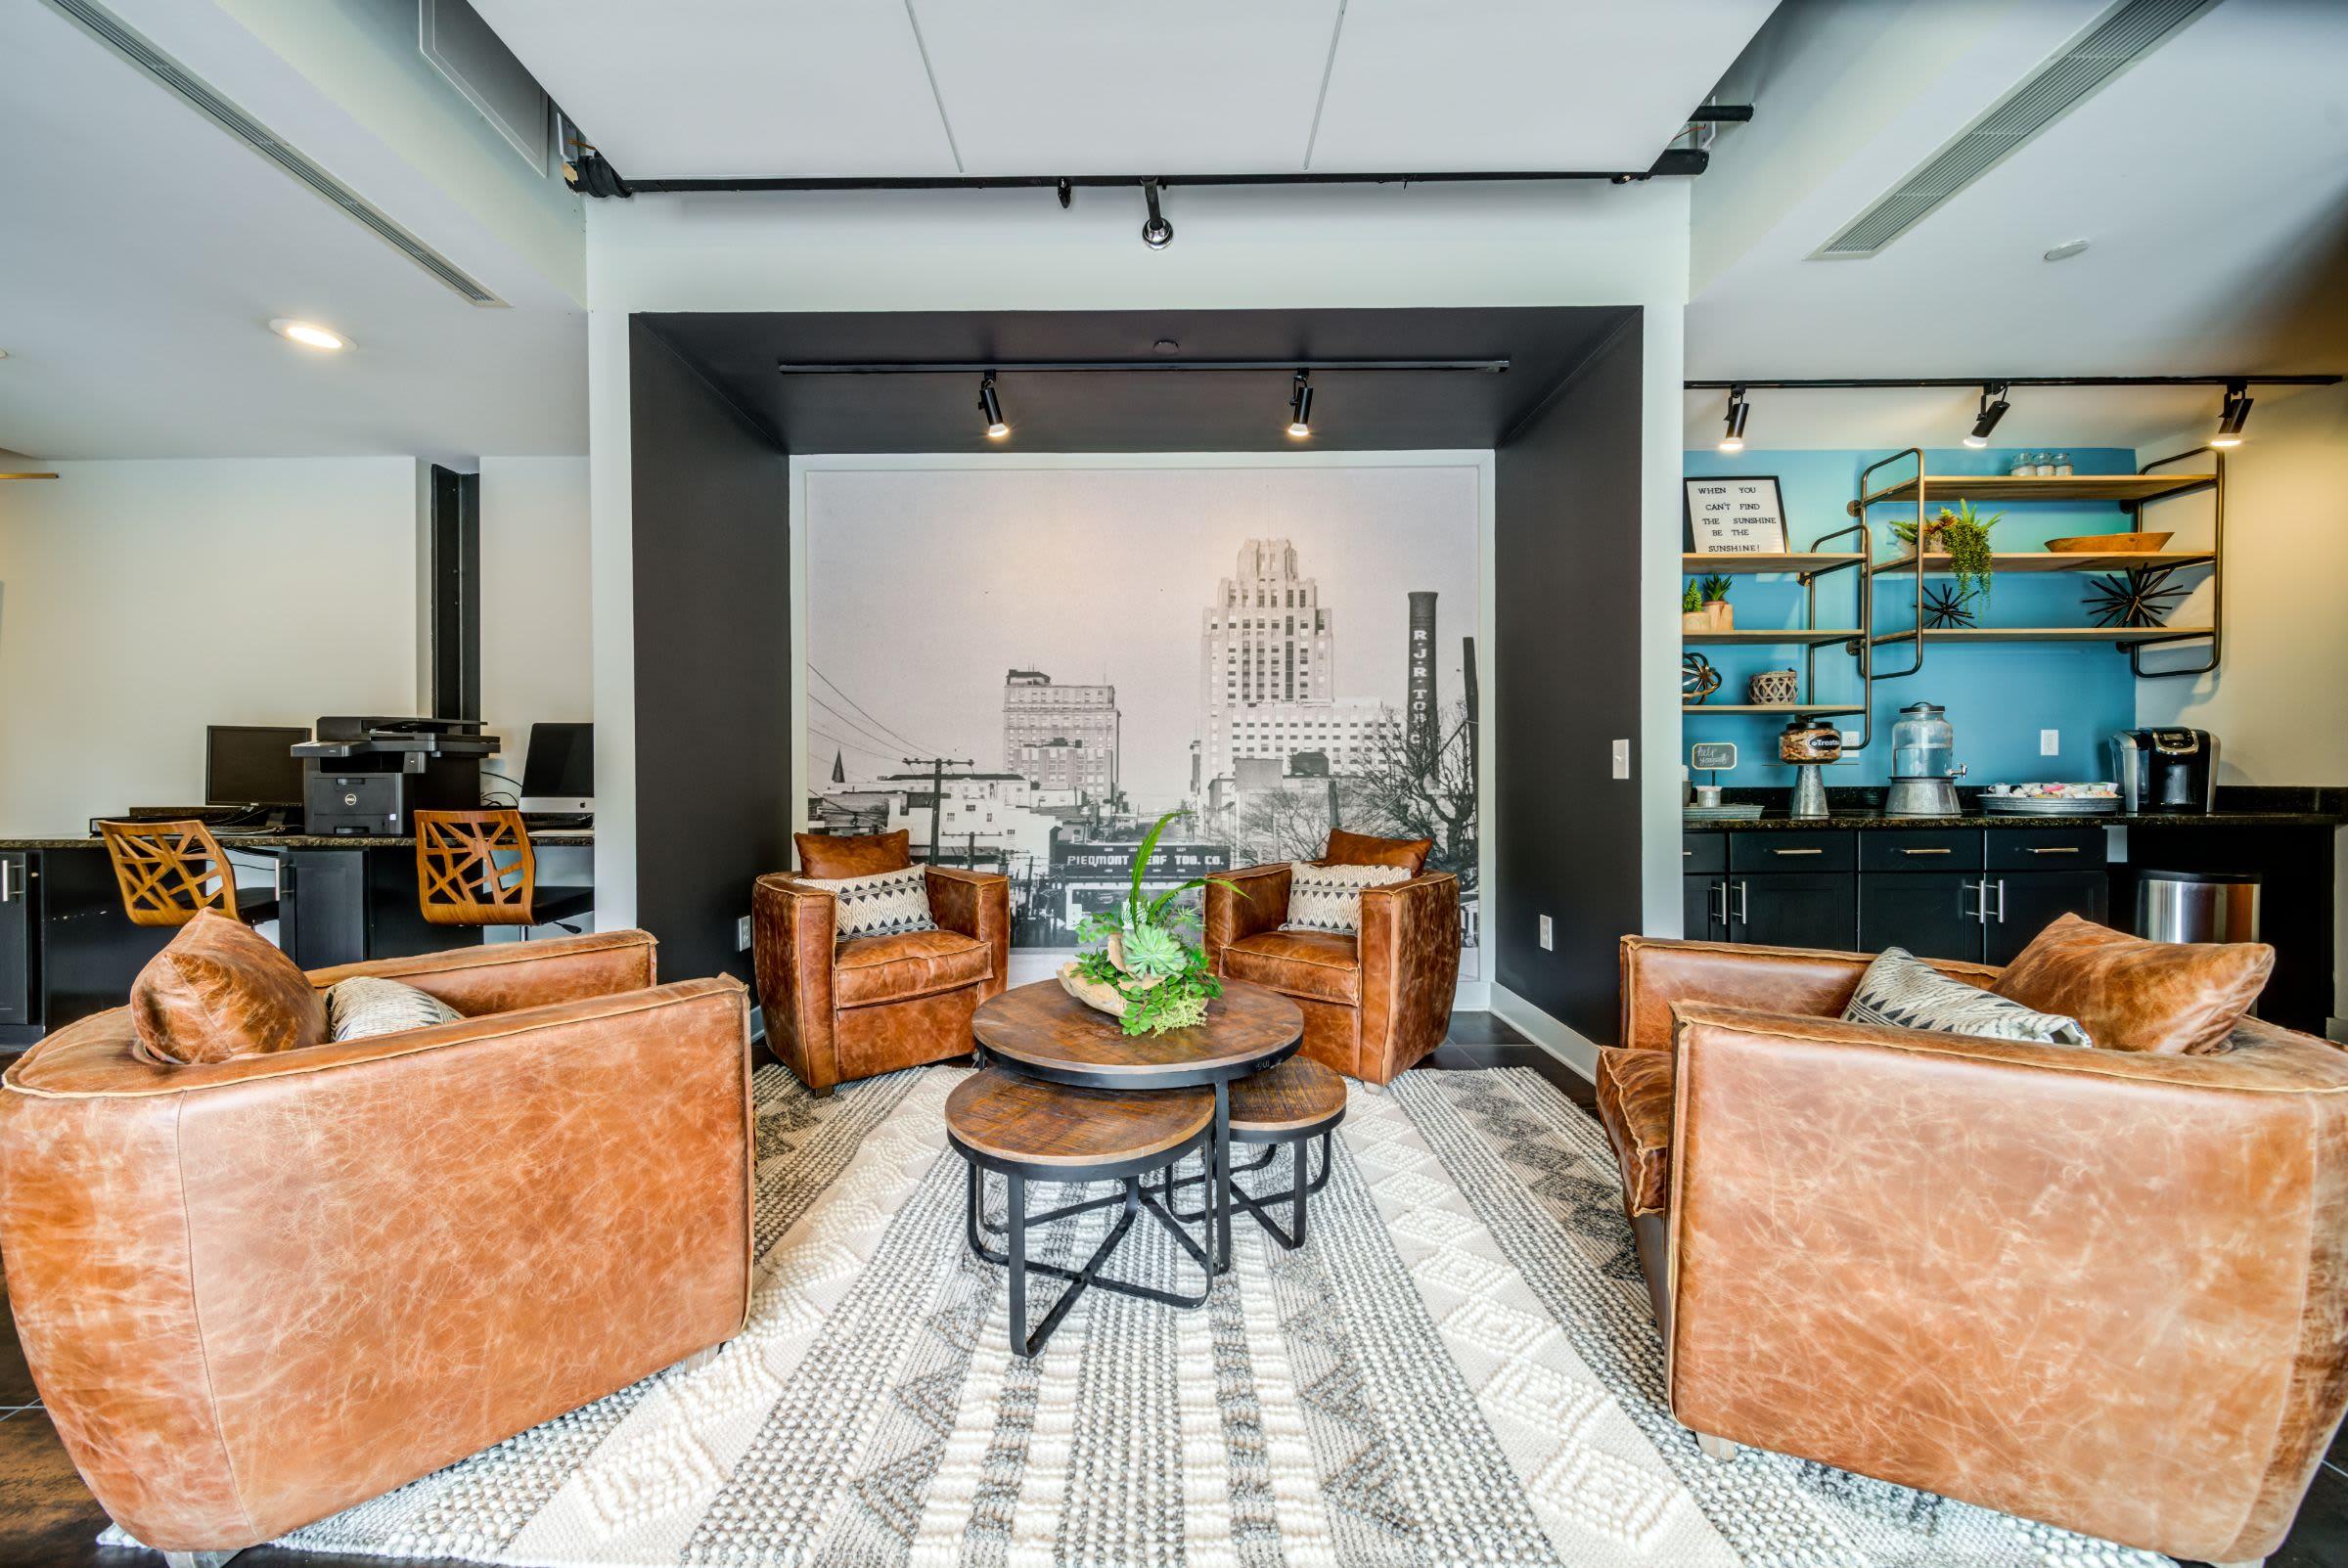 Modern lobby area at The Gallery Lofts in Winston Salem, North Carolina